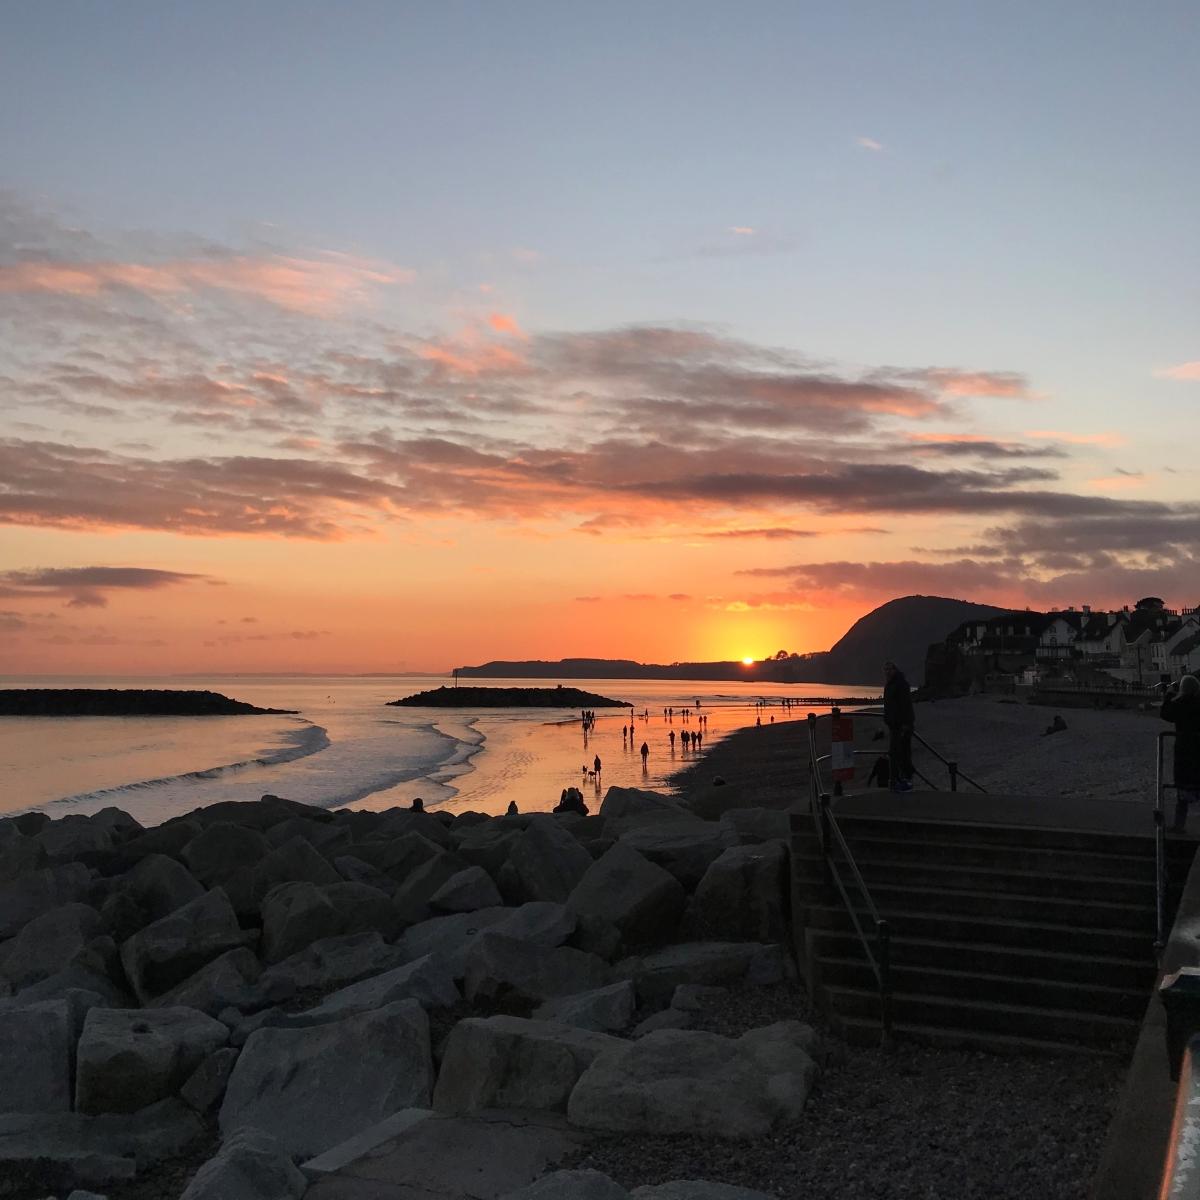 sidmouth beach, devon at sunset